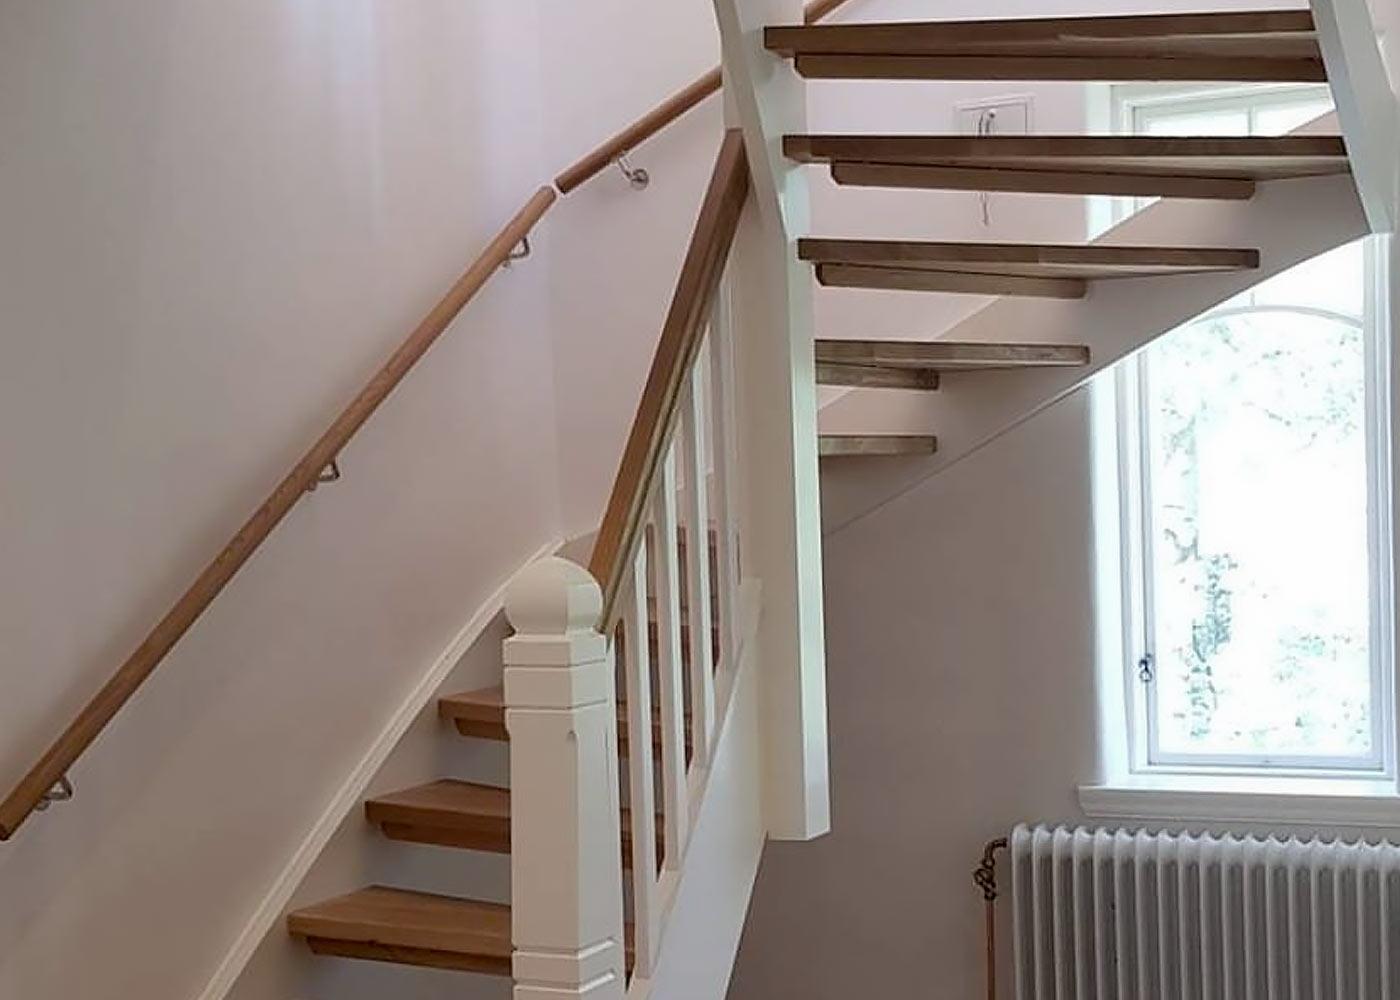 u-trappa -trapptillverkaren trappor